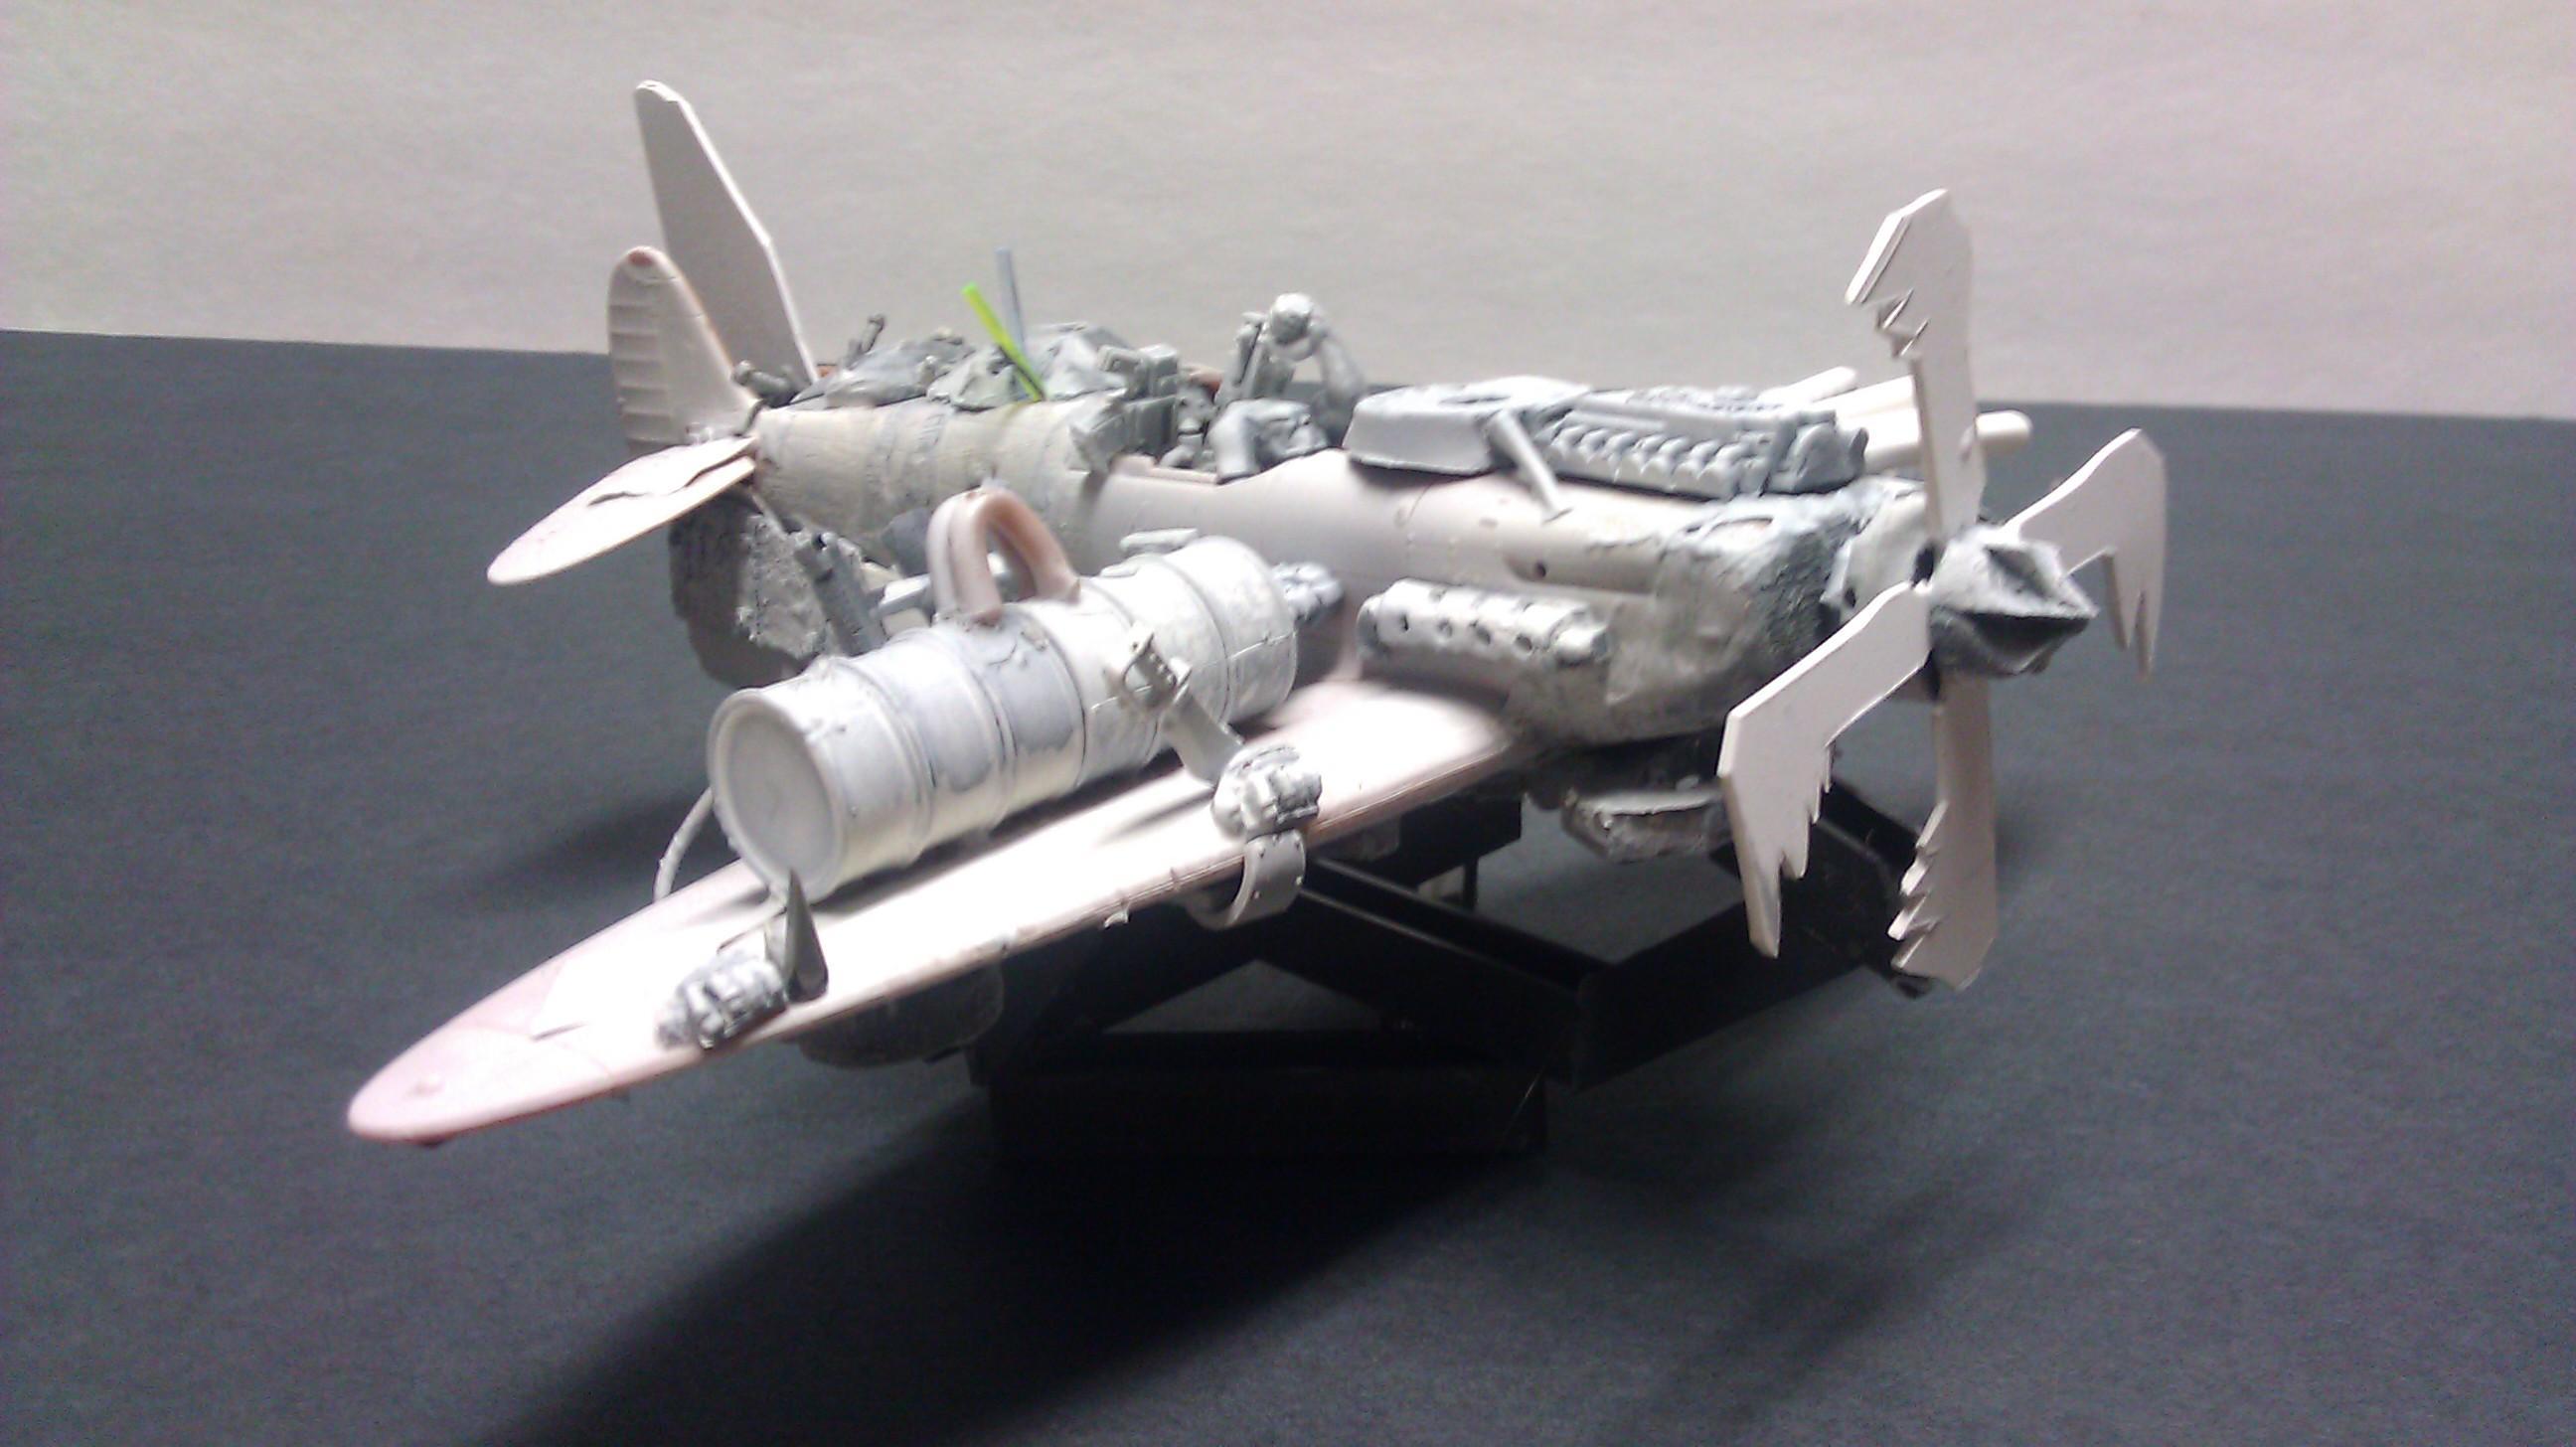 Bomber, Custom, Flama Jet, Jet, Orks, Shoota Jet, Warhammer 40,000